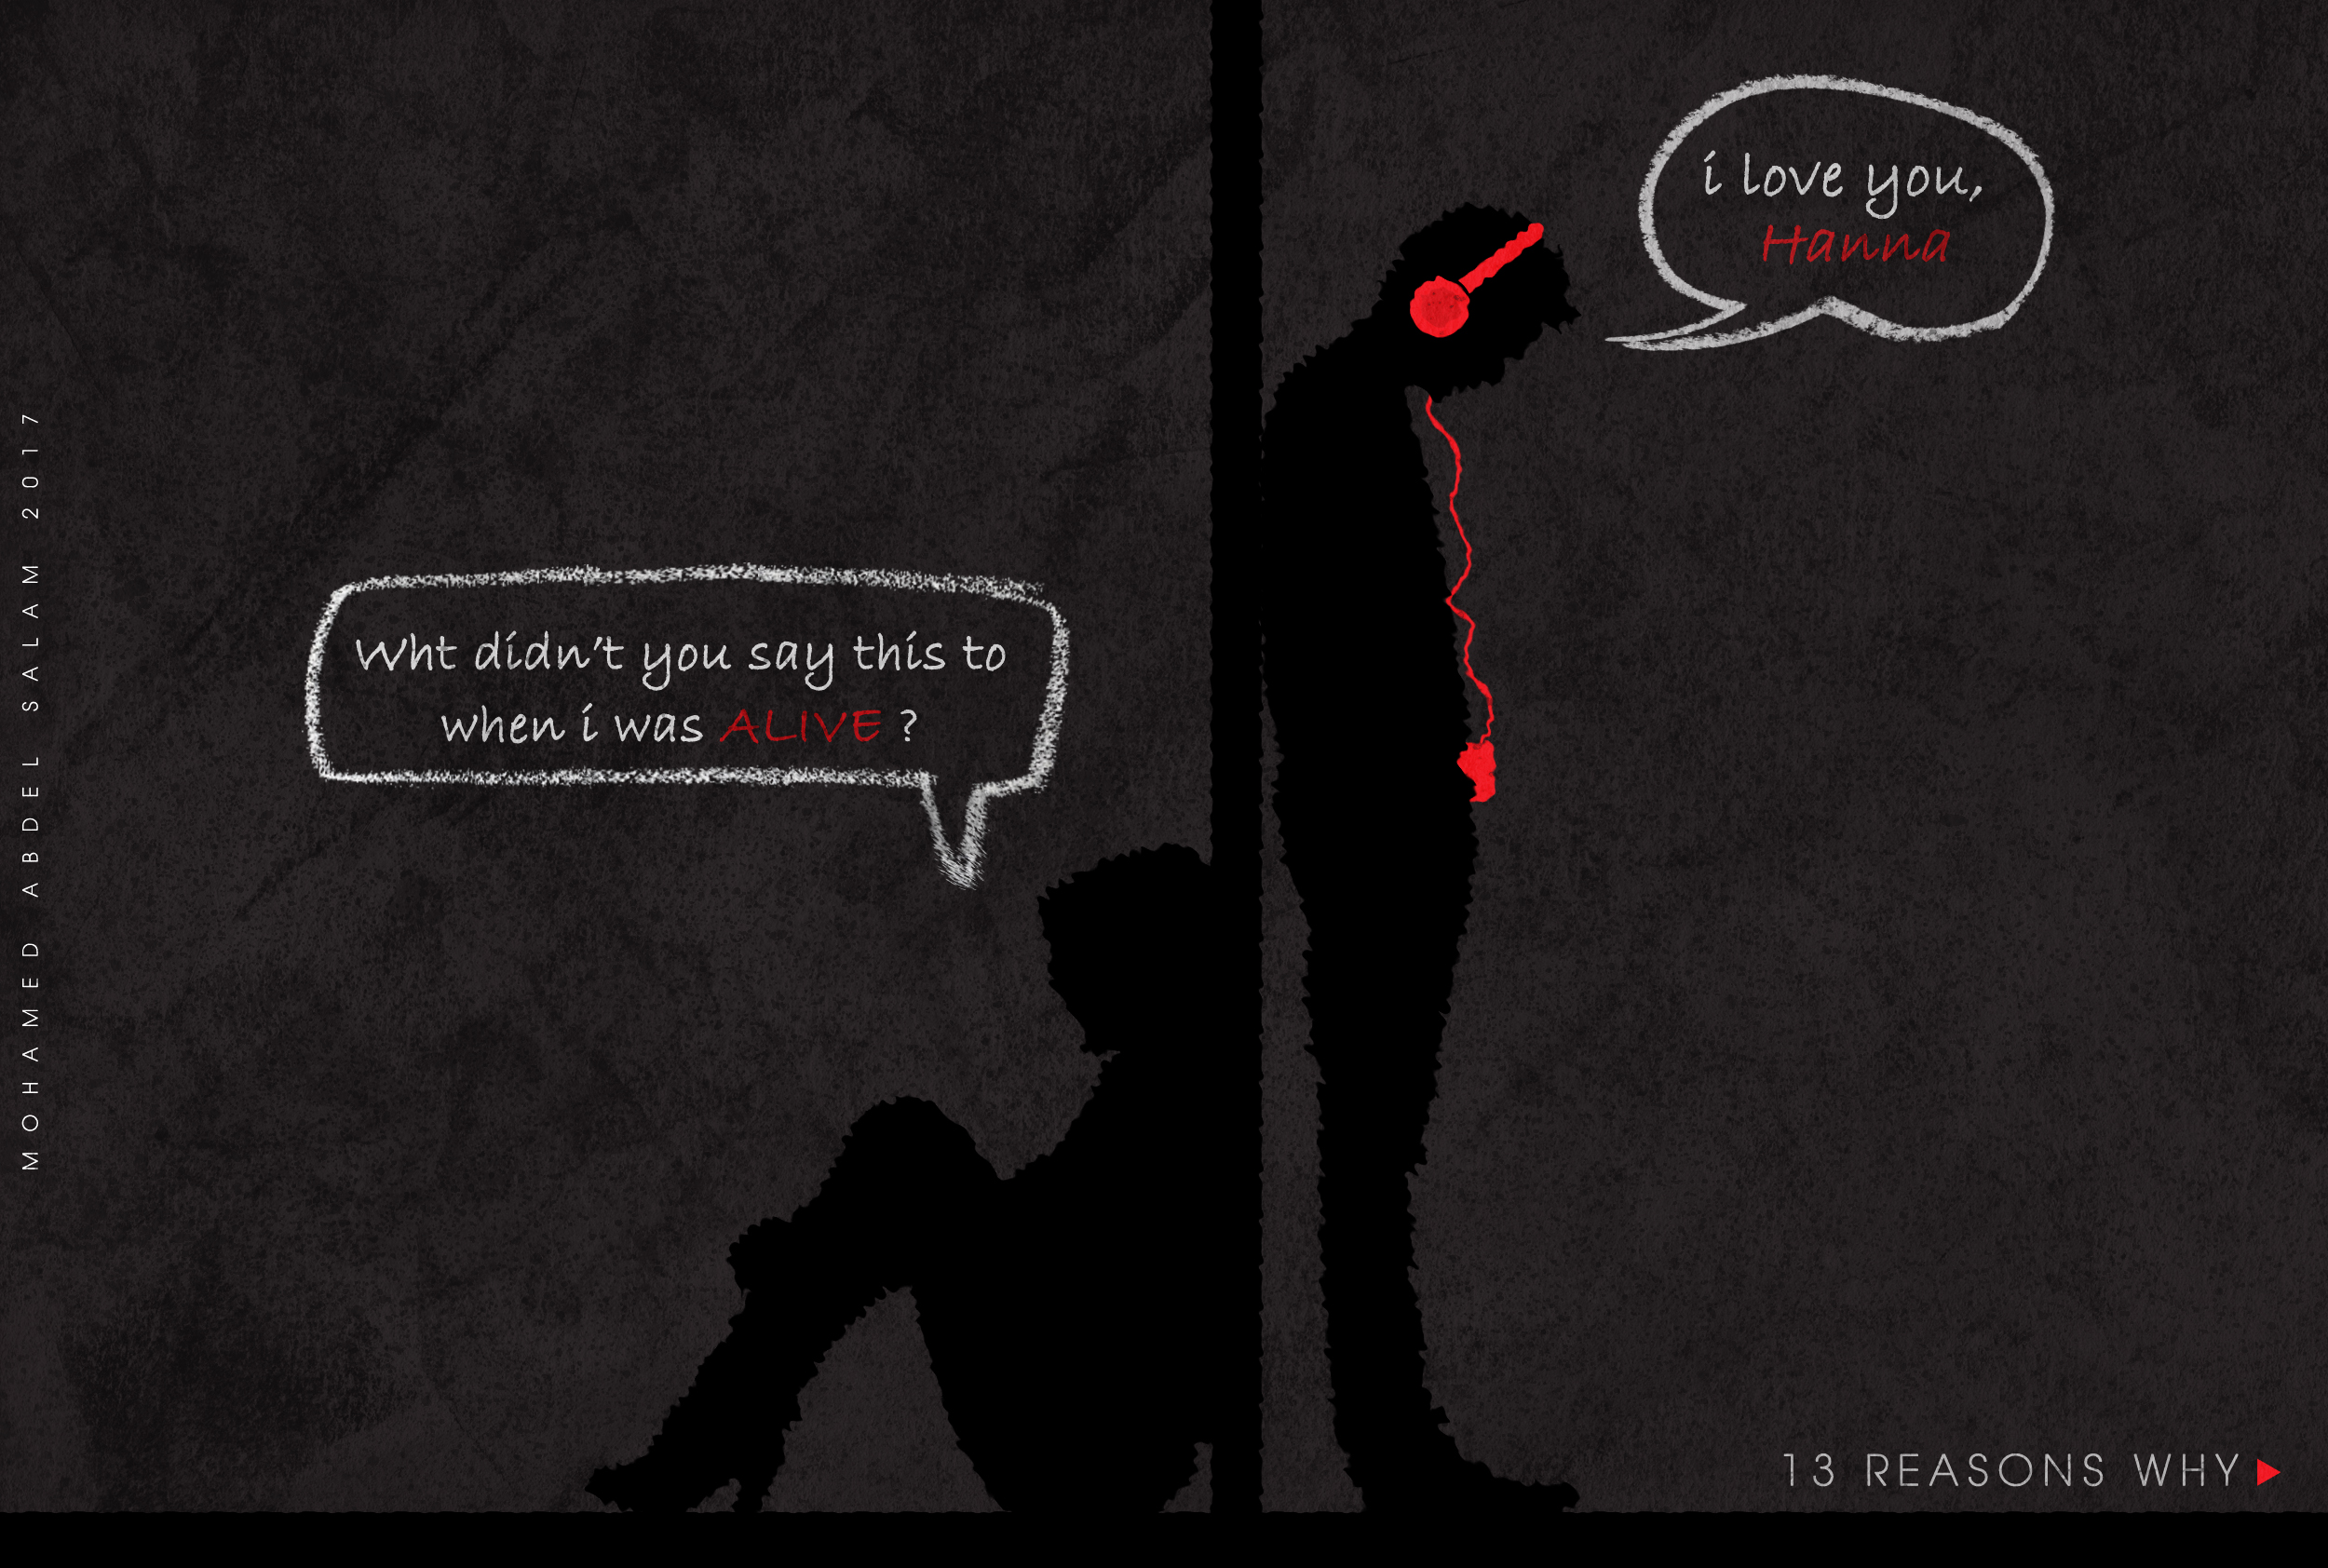 I Love You Hanna - 13 Reasons Why - Beyond Reasons